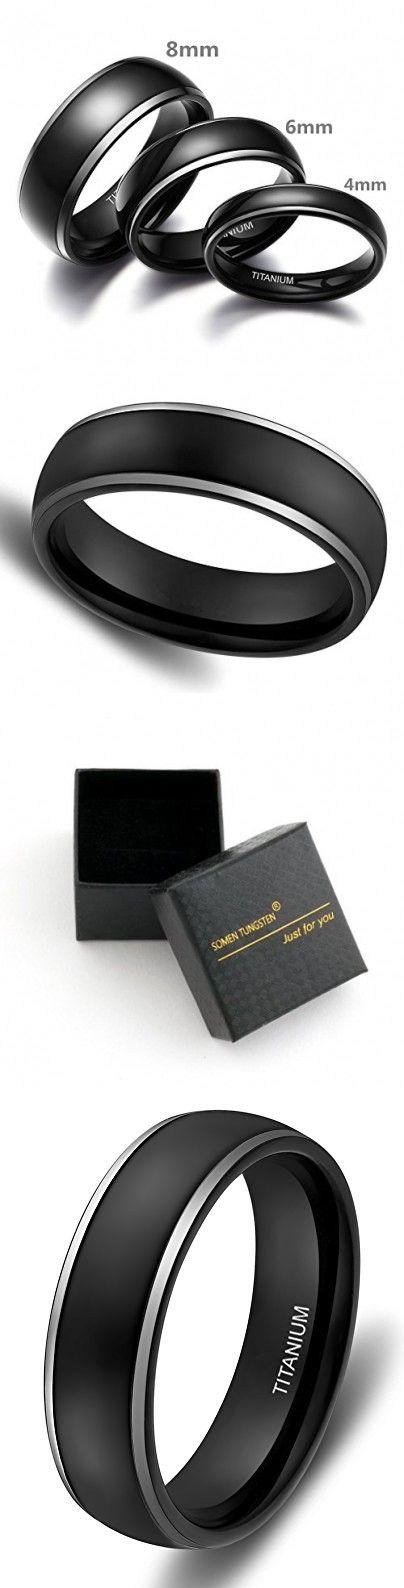 4mm 6mm 8mm Titanium Rings for Men Women Black Dome Two Tone Polish Wedding Band (titanium, 8)